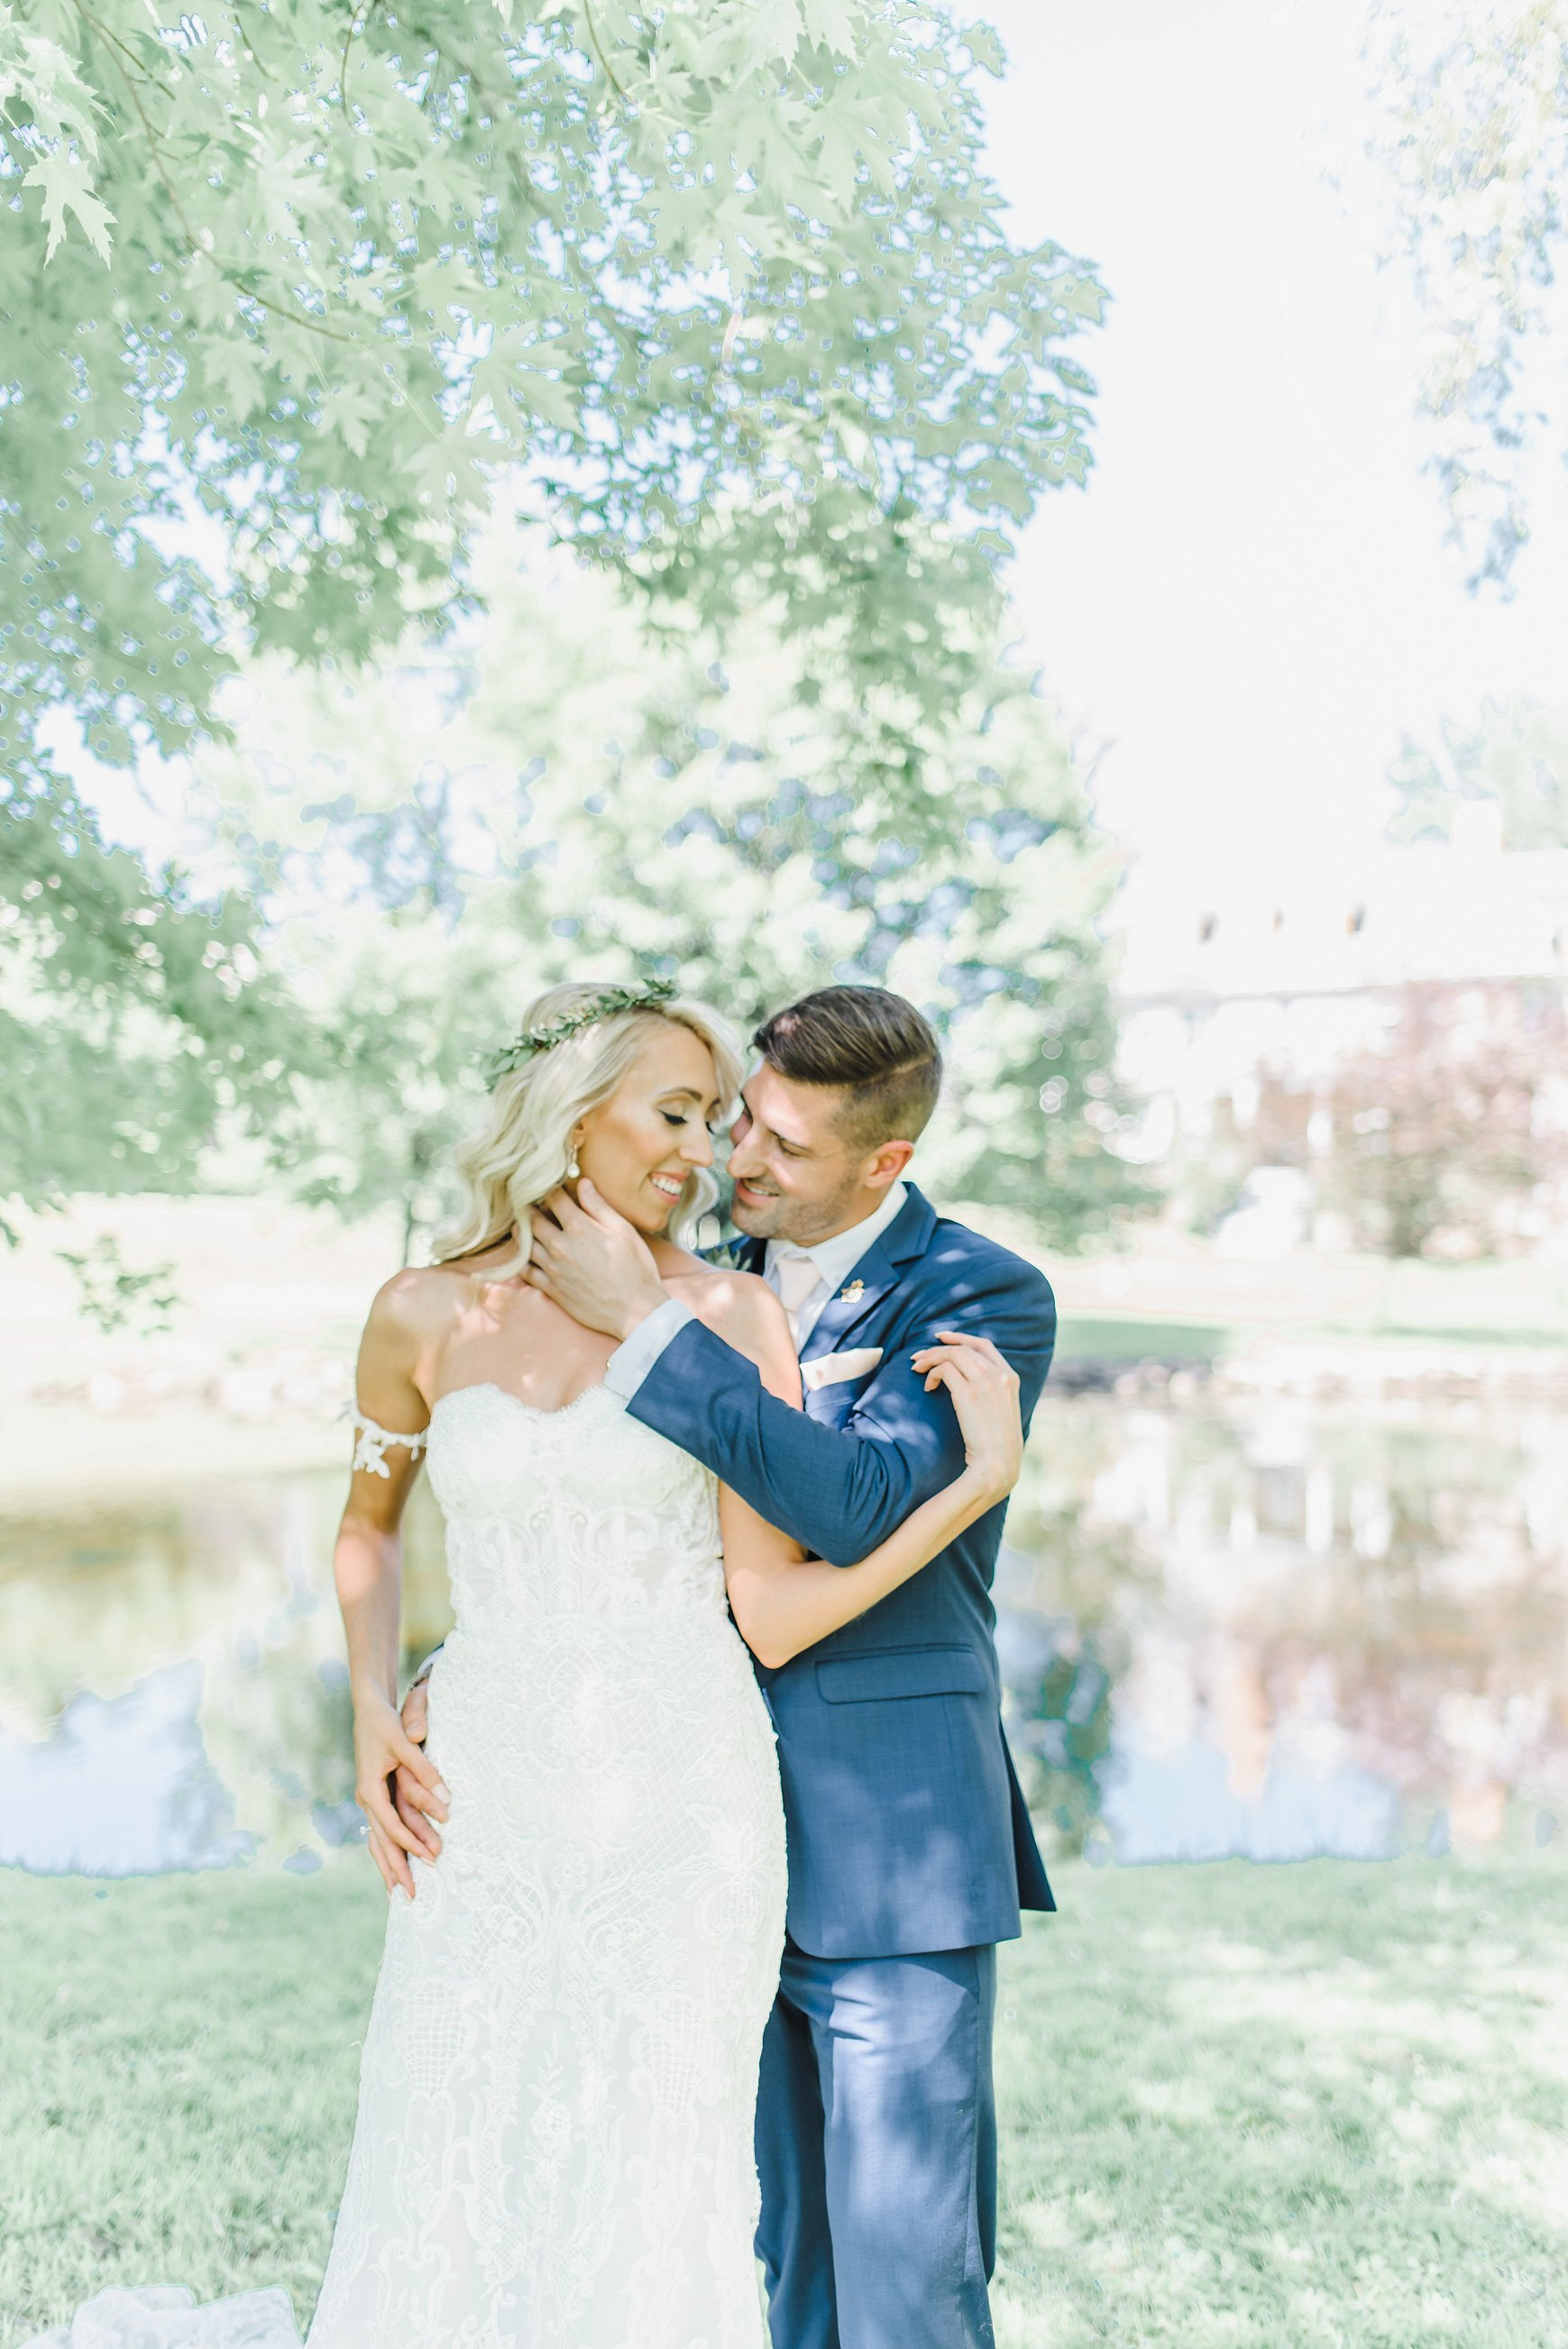 light airy indie fine art ottawa wedding photographer | Ali and Batoul Photography_0053.jpg